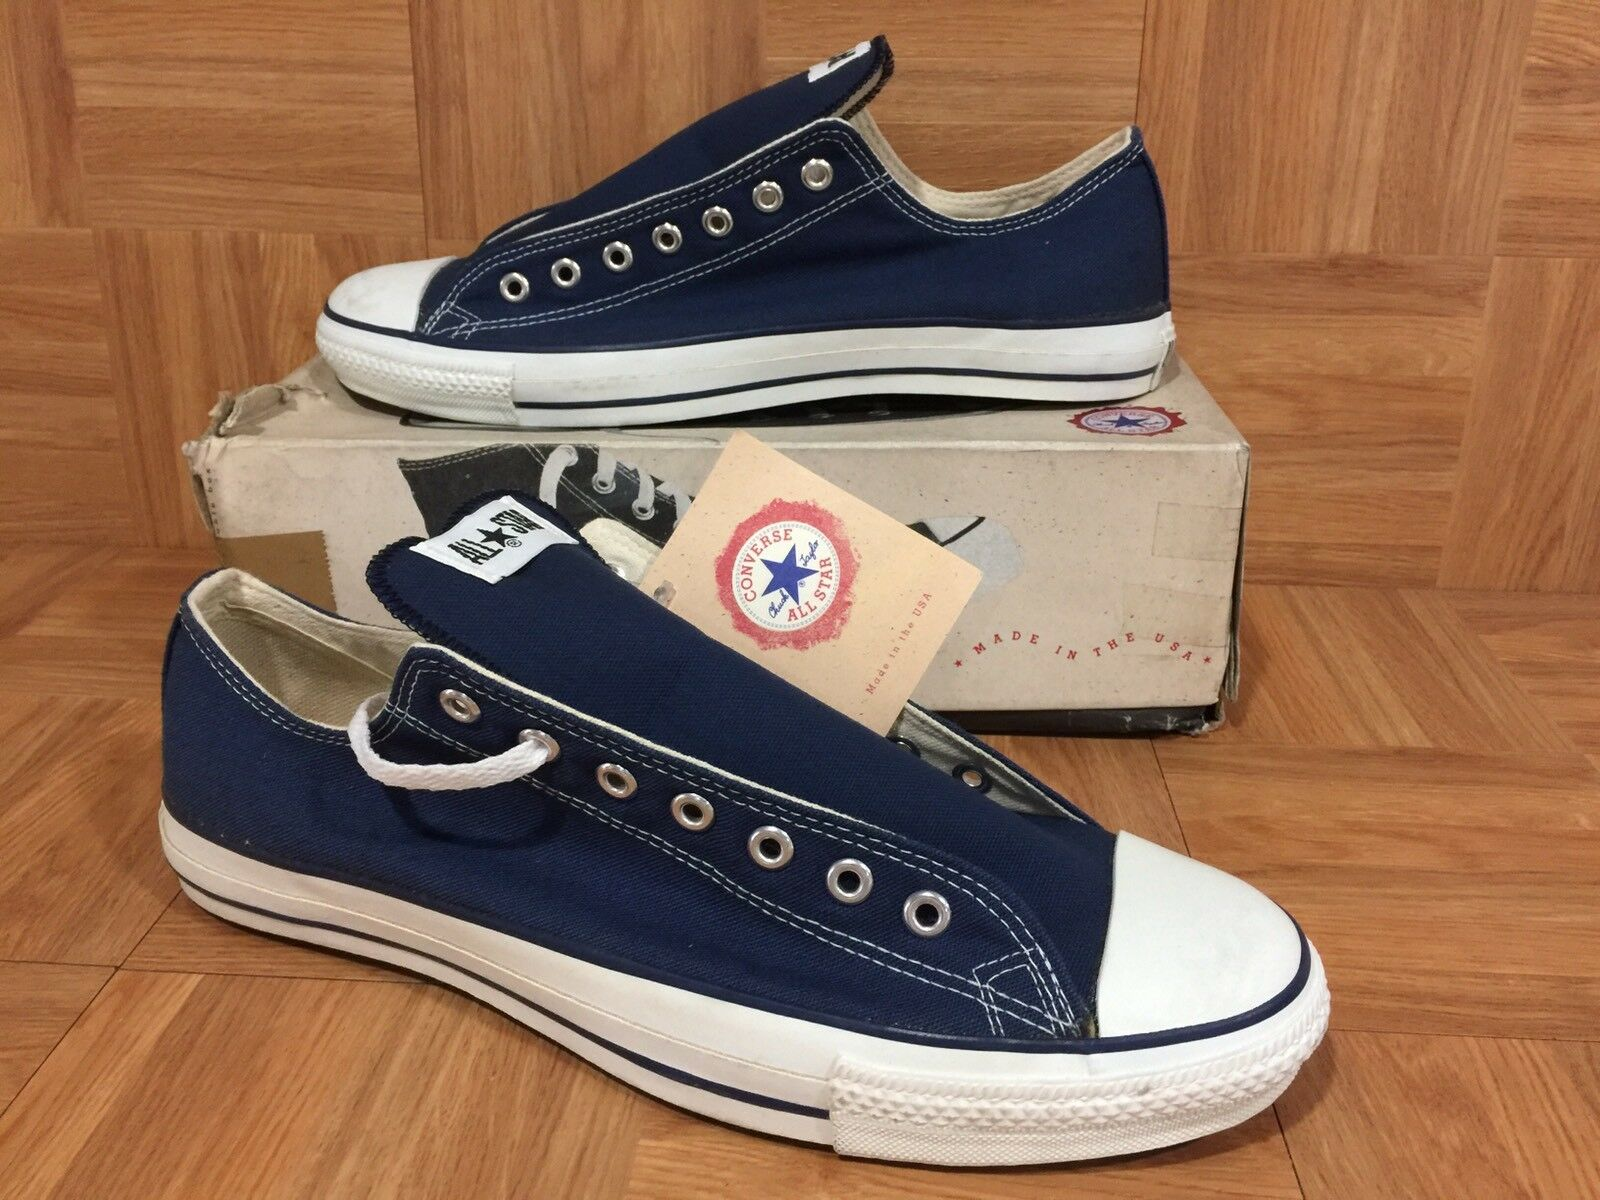 VTG Converse Chuck Taylor All Star Original Hi bluee Canvas Made In USA 13  5